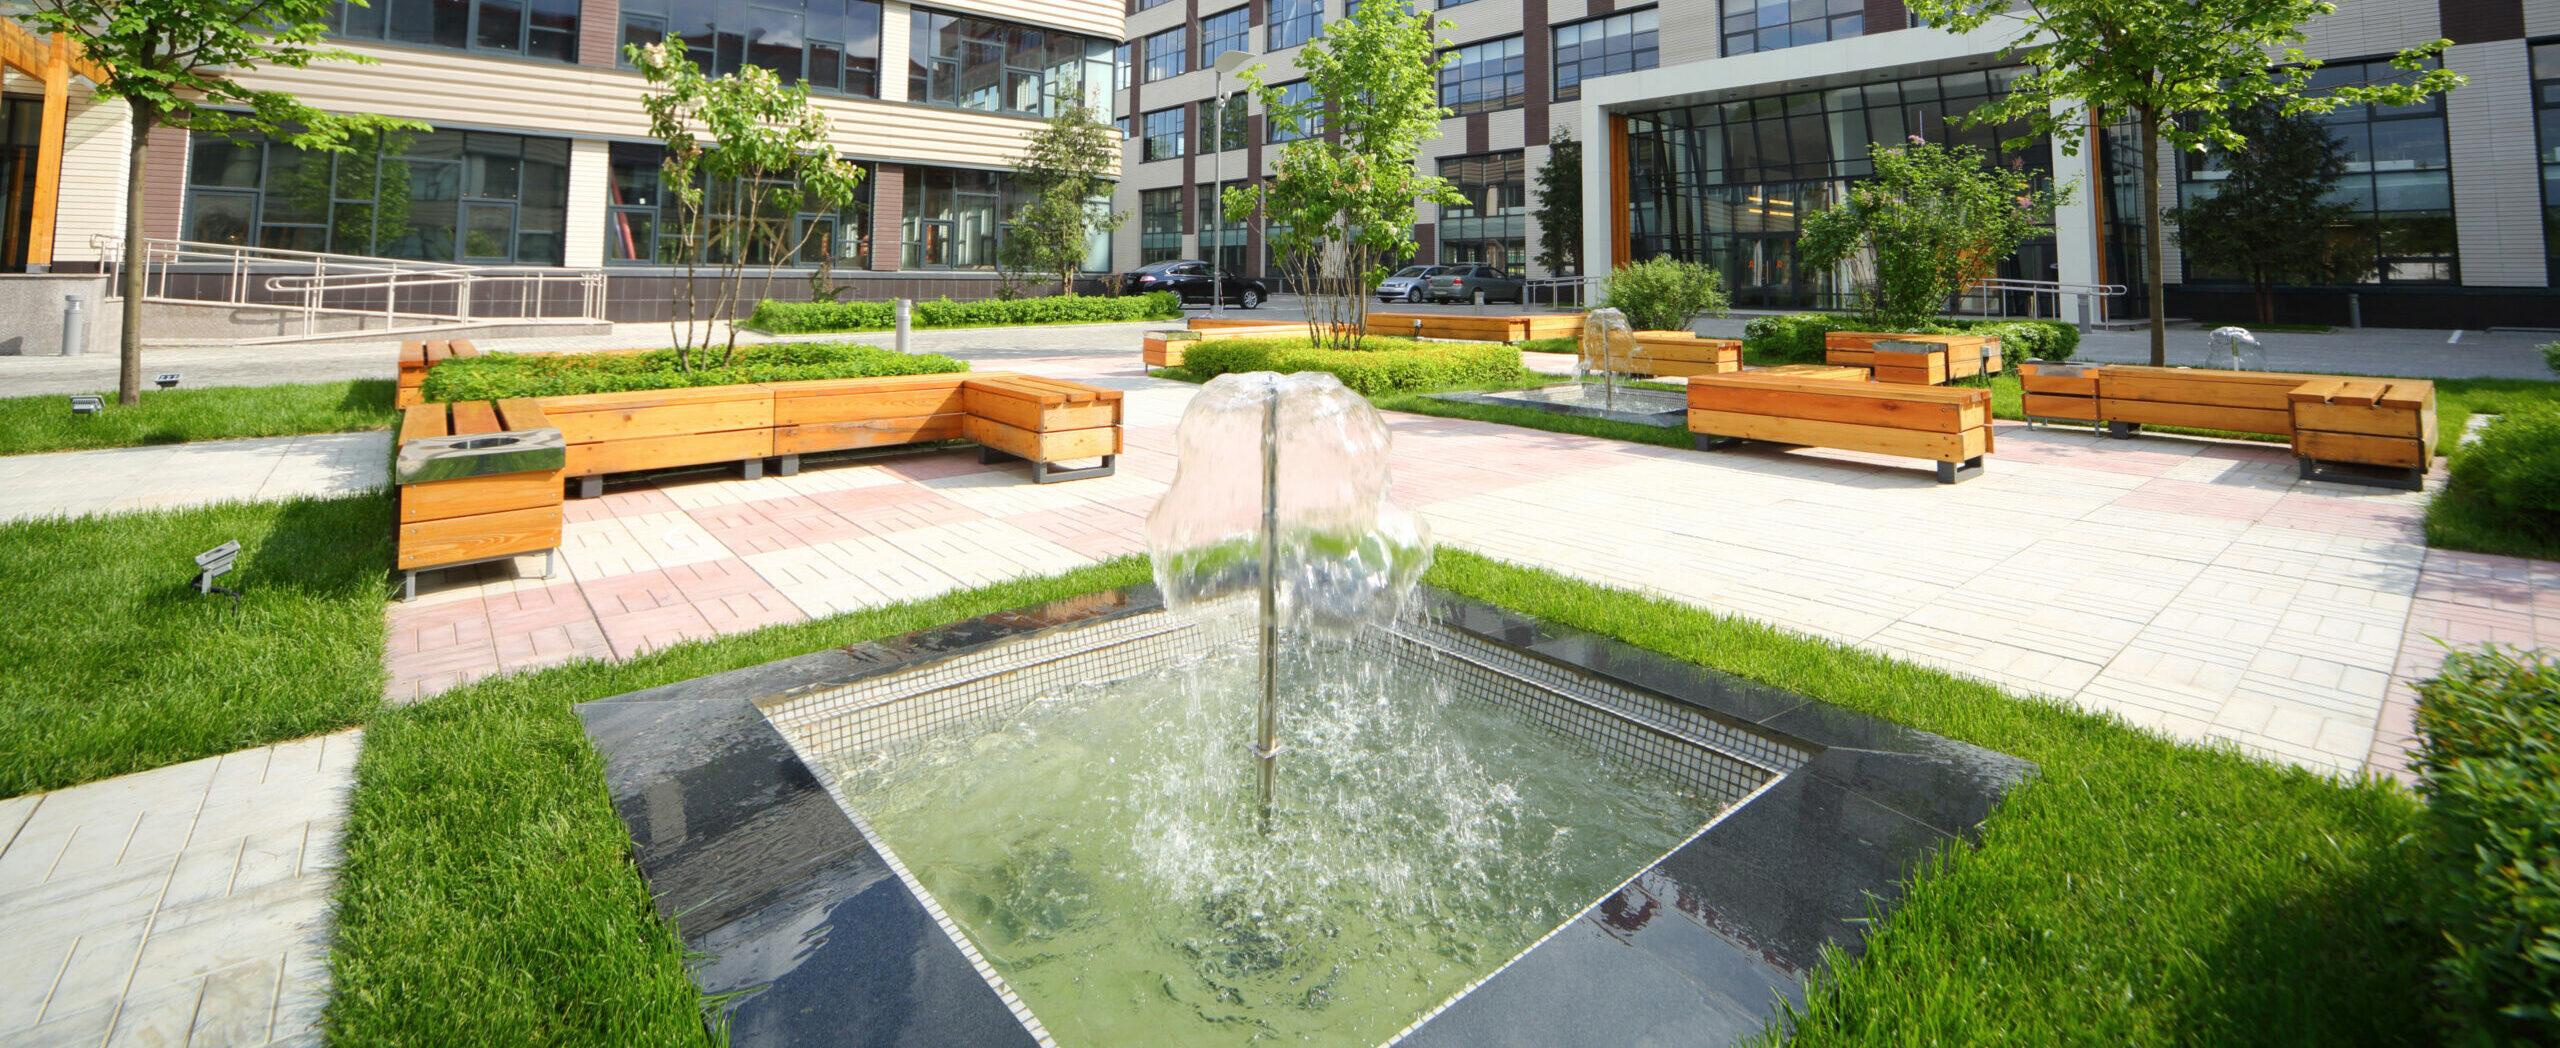 Outdoor estates compliance efficient single contractor